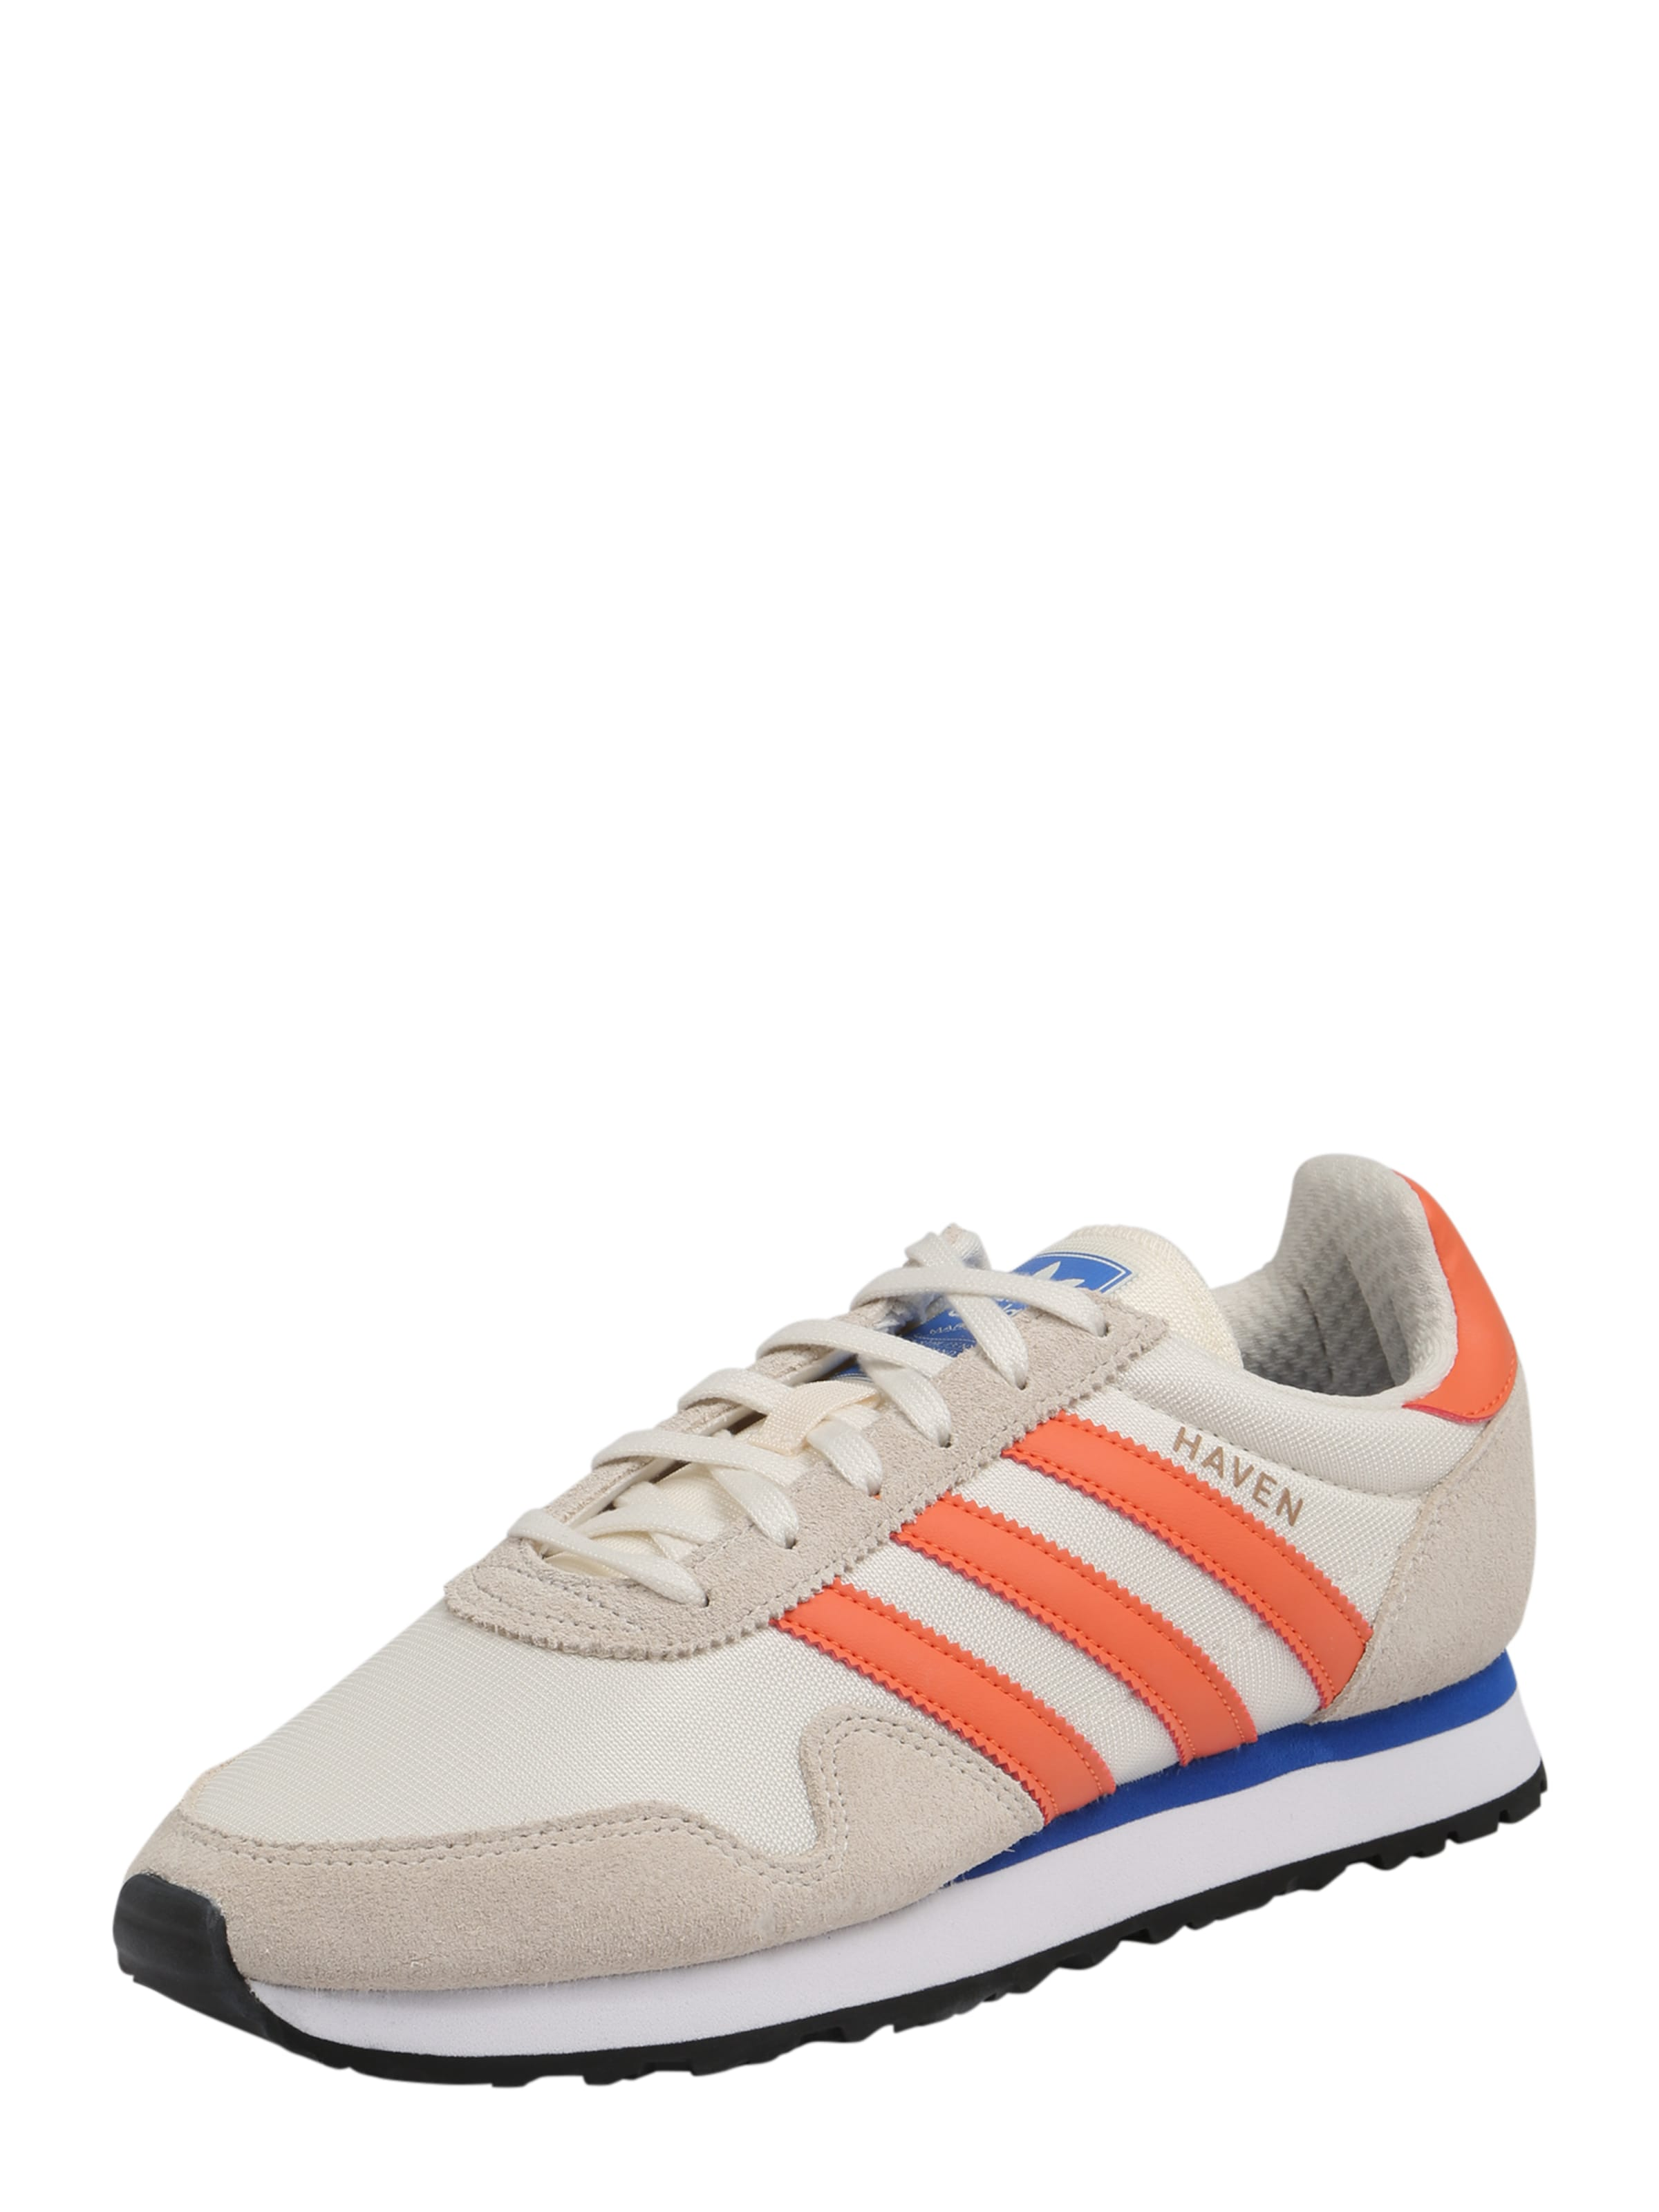 ADIDAS ORIGINALS Sneaker  HAVEN